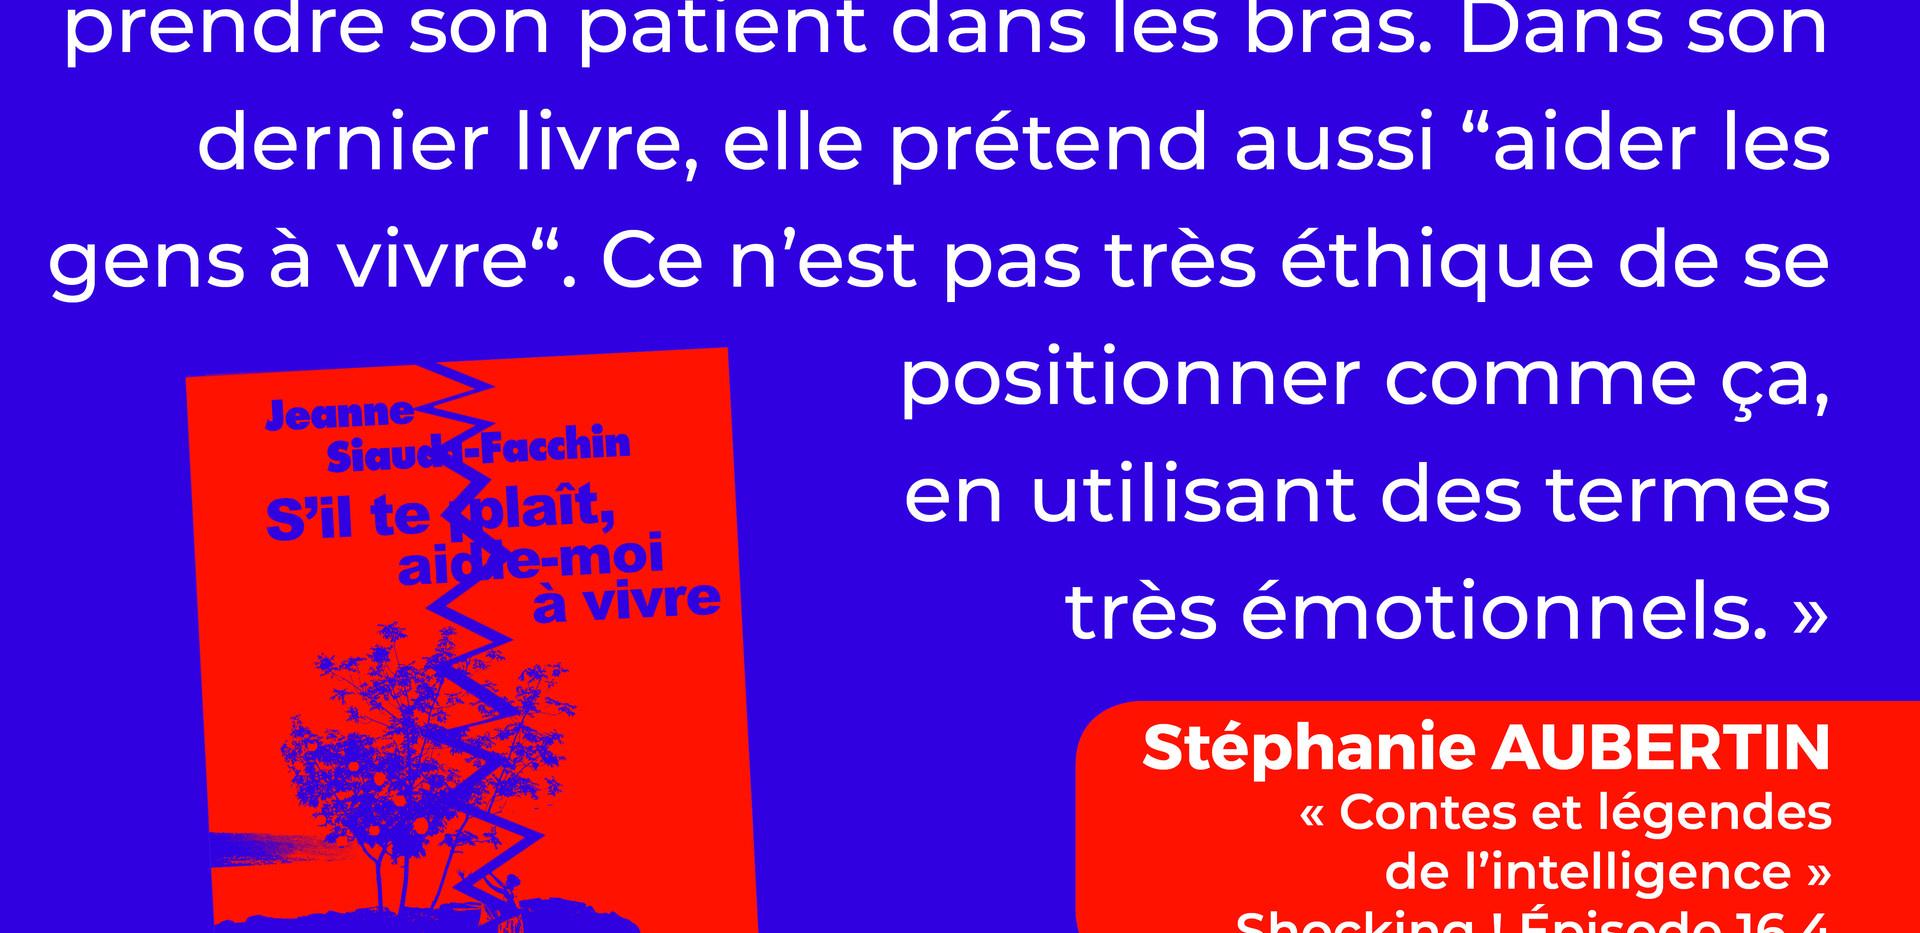 Jeanne Siaud-Facchin à la dérive